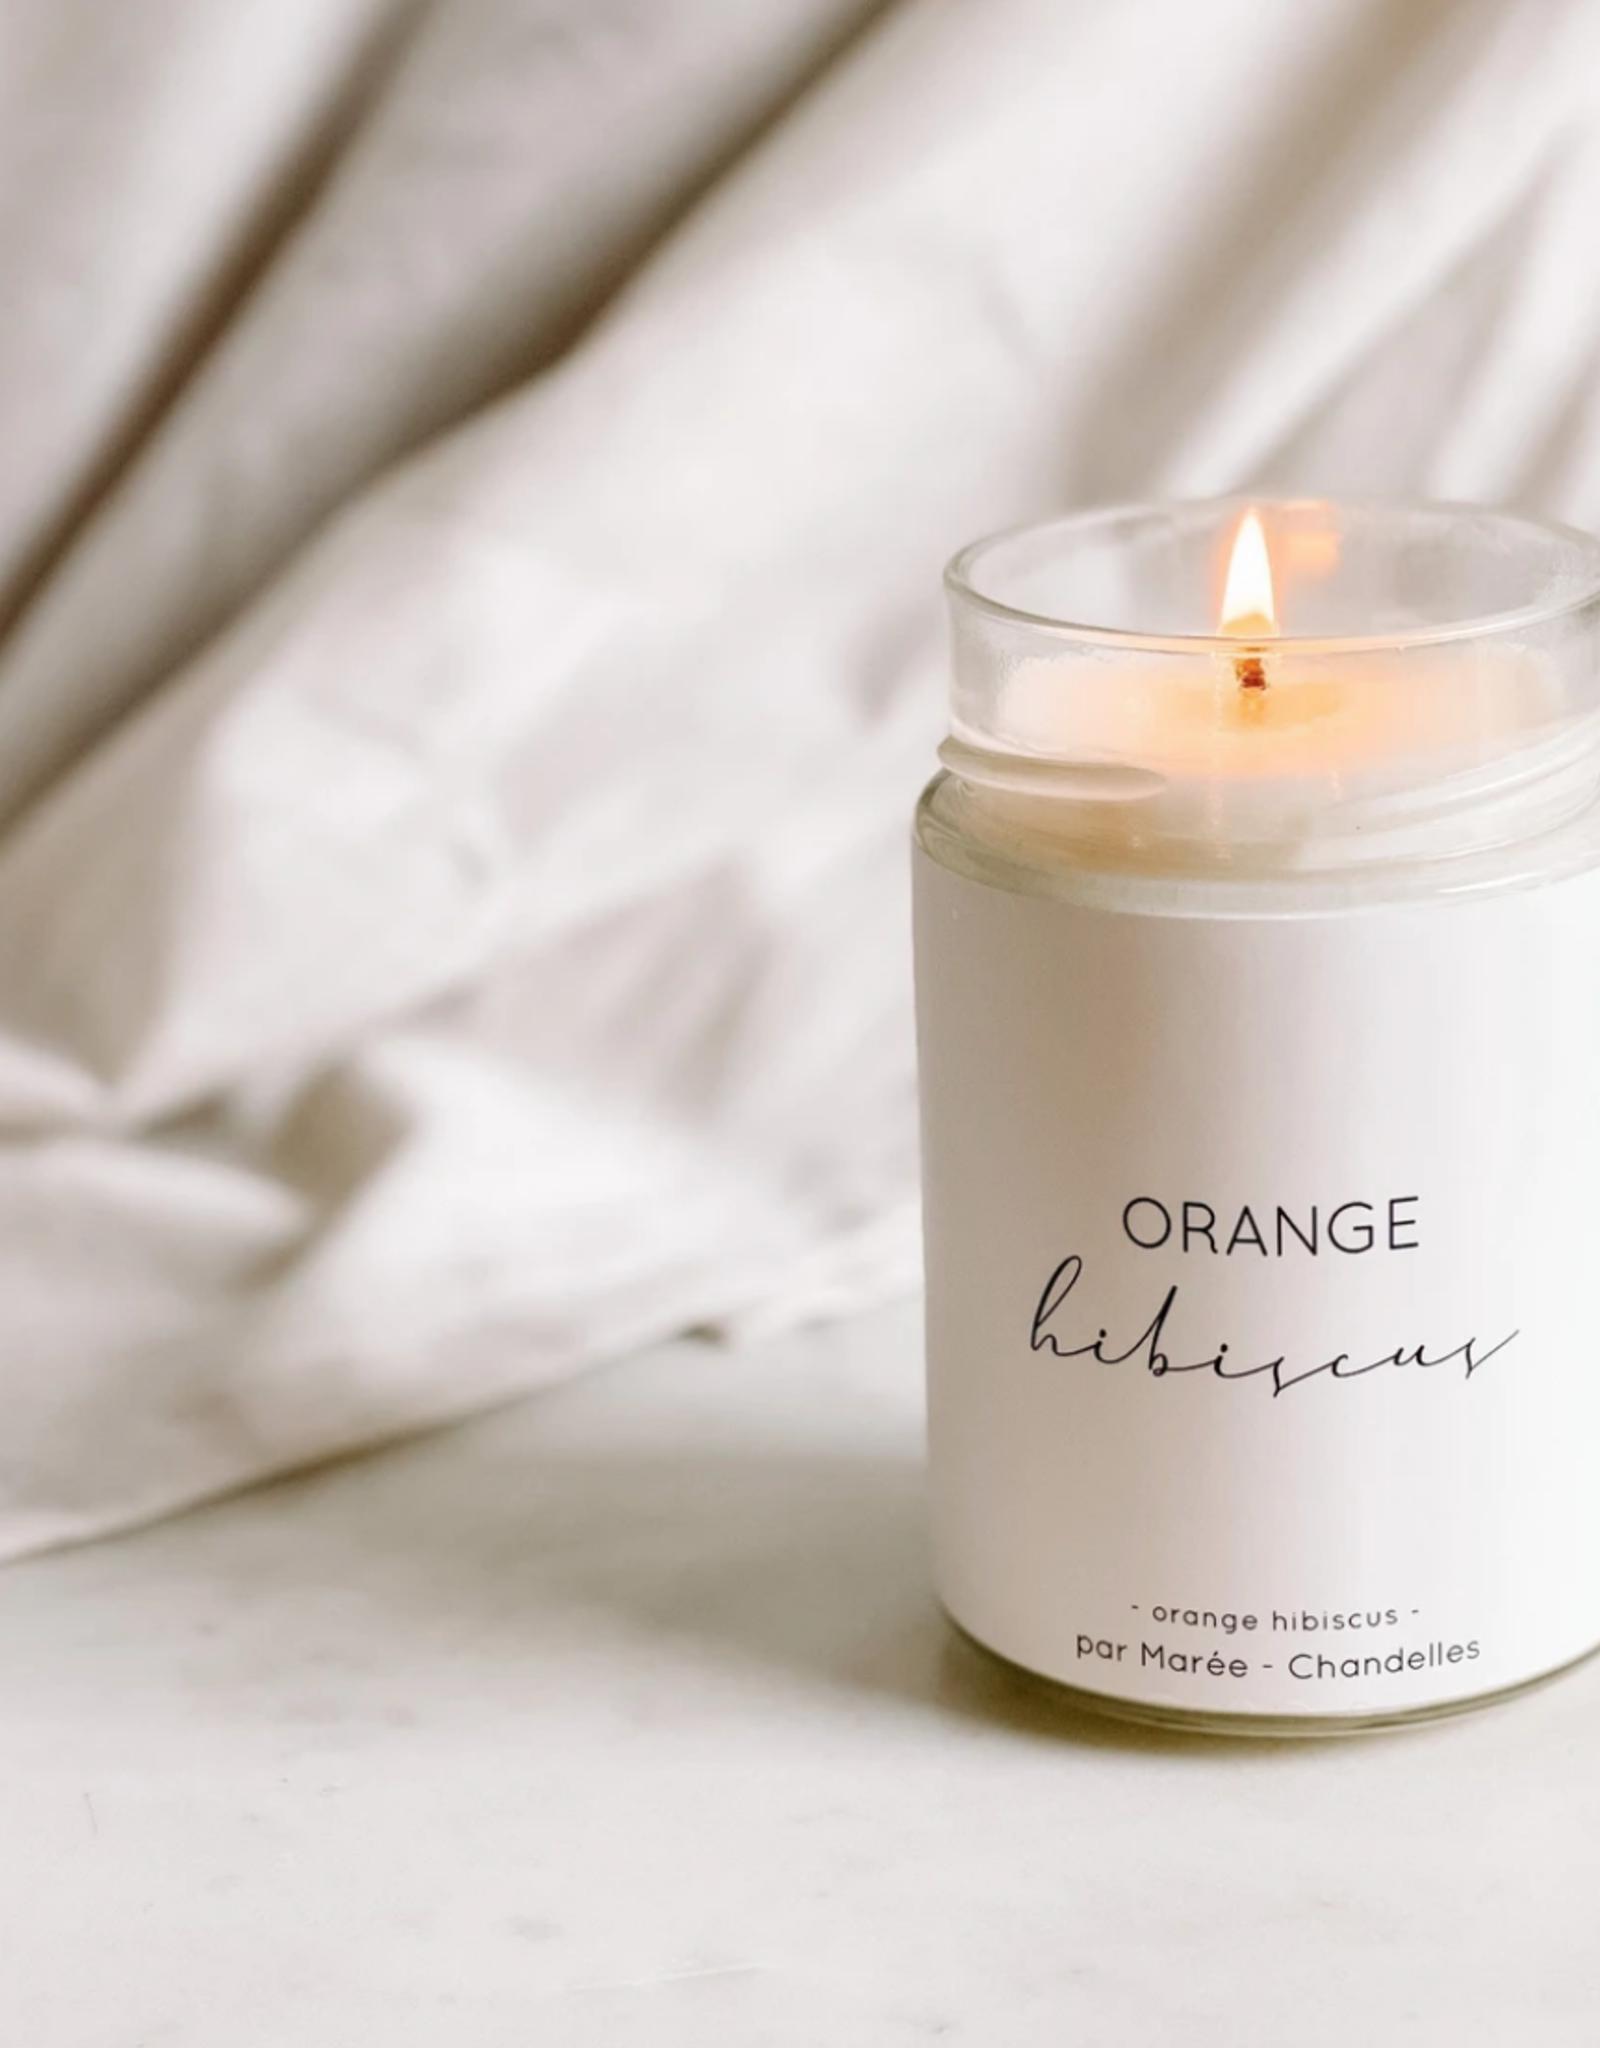 Marée Chandelles Maree - Chandelle Orange Hibiscus